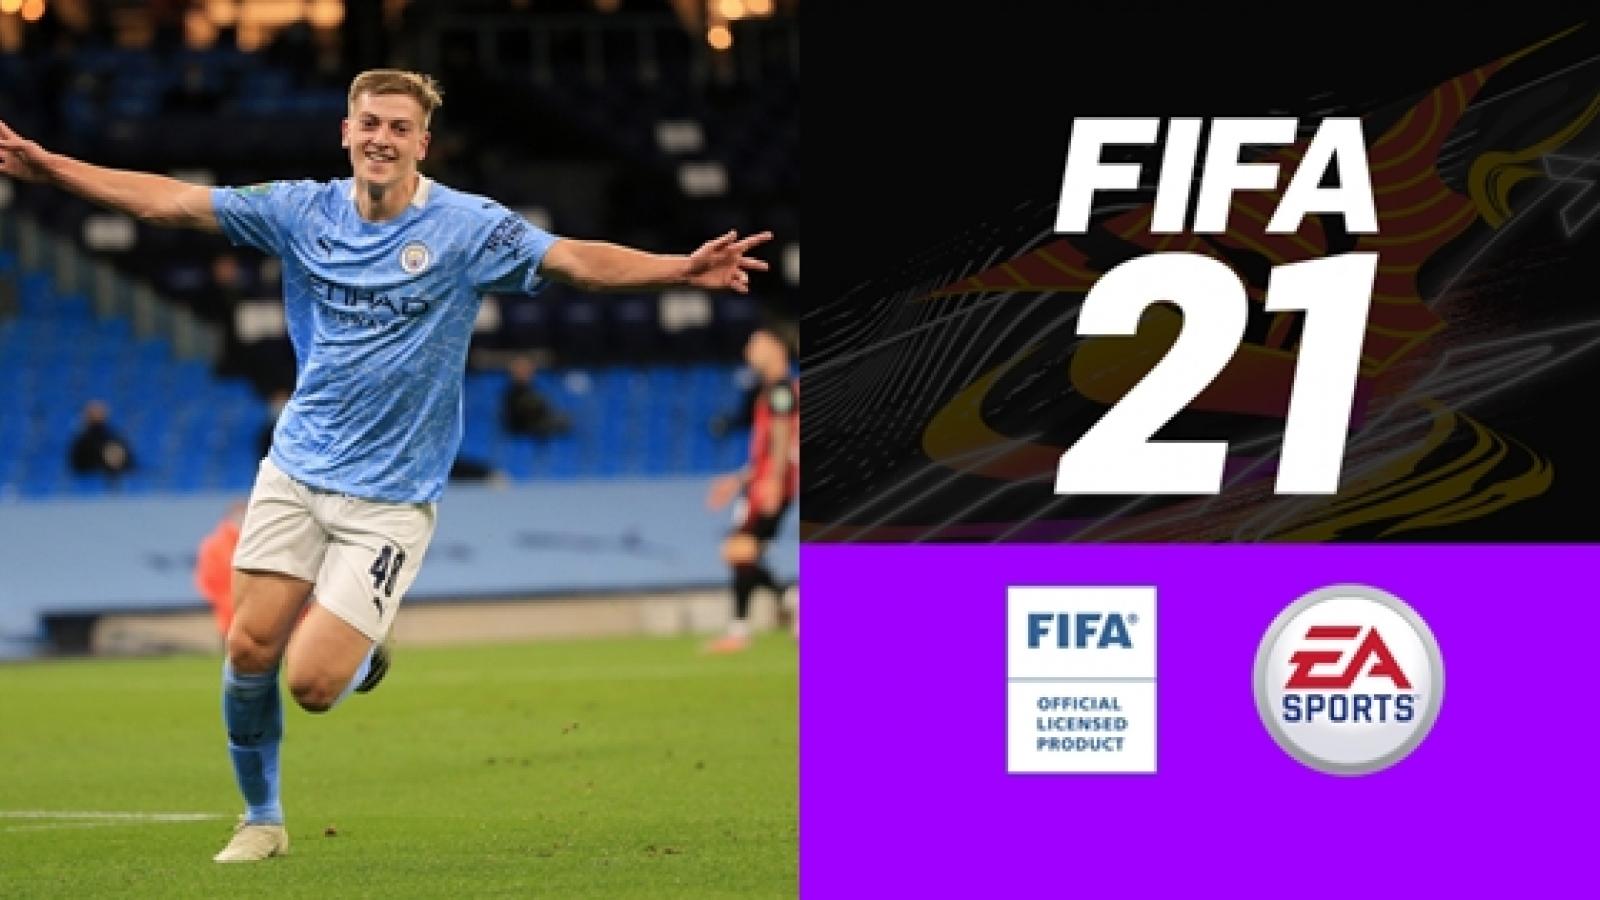 Top 10 sao trẻ Premier League có tiềm năng phát triển thần tốc trong FIFA 21